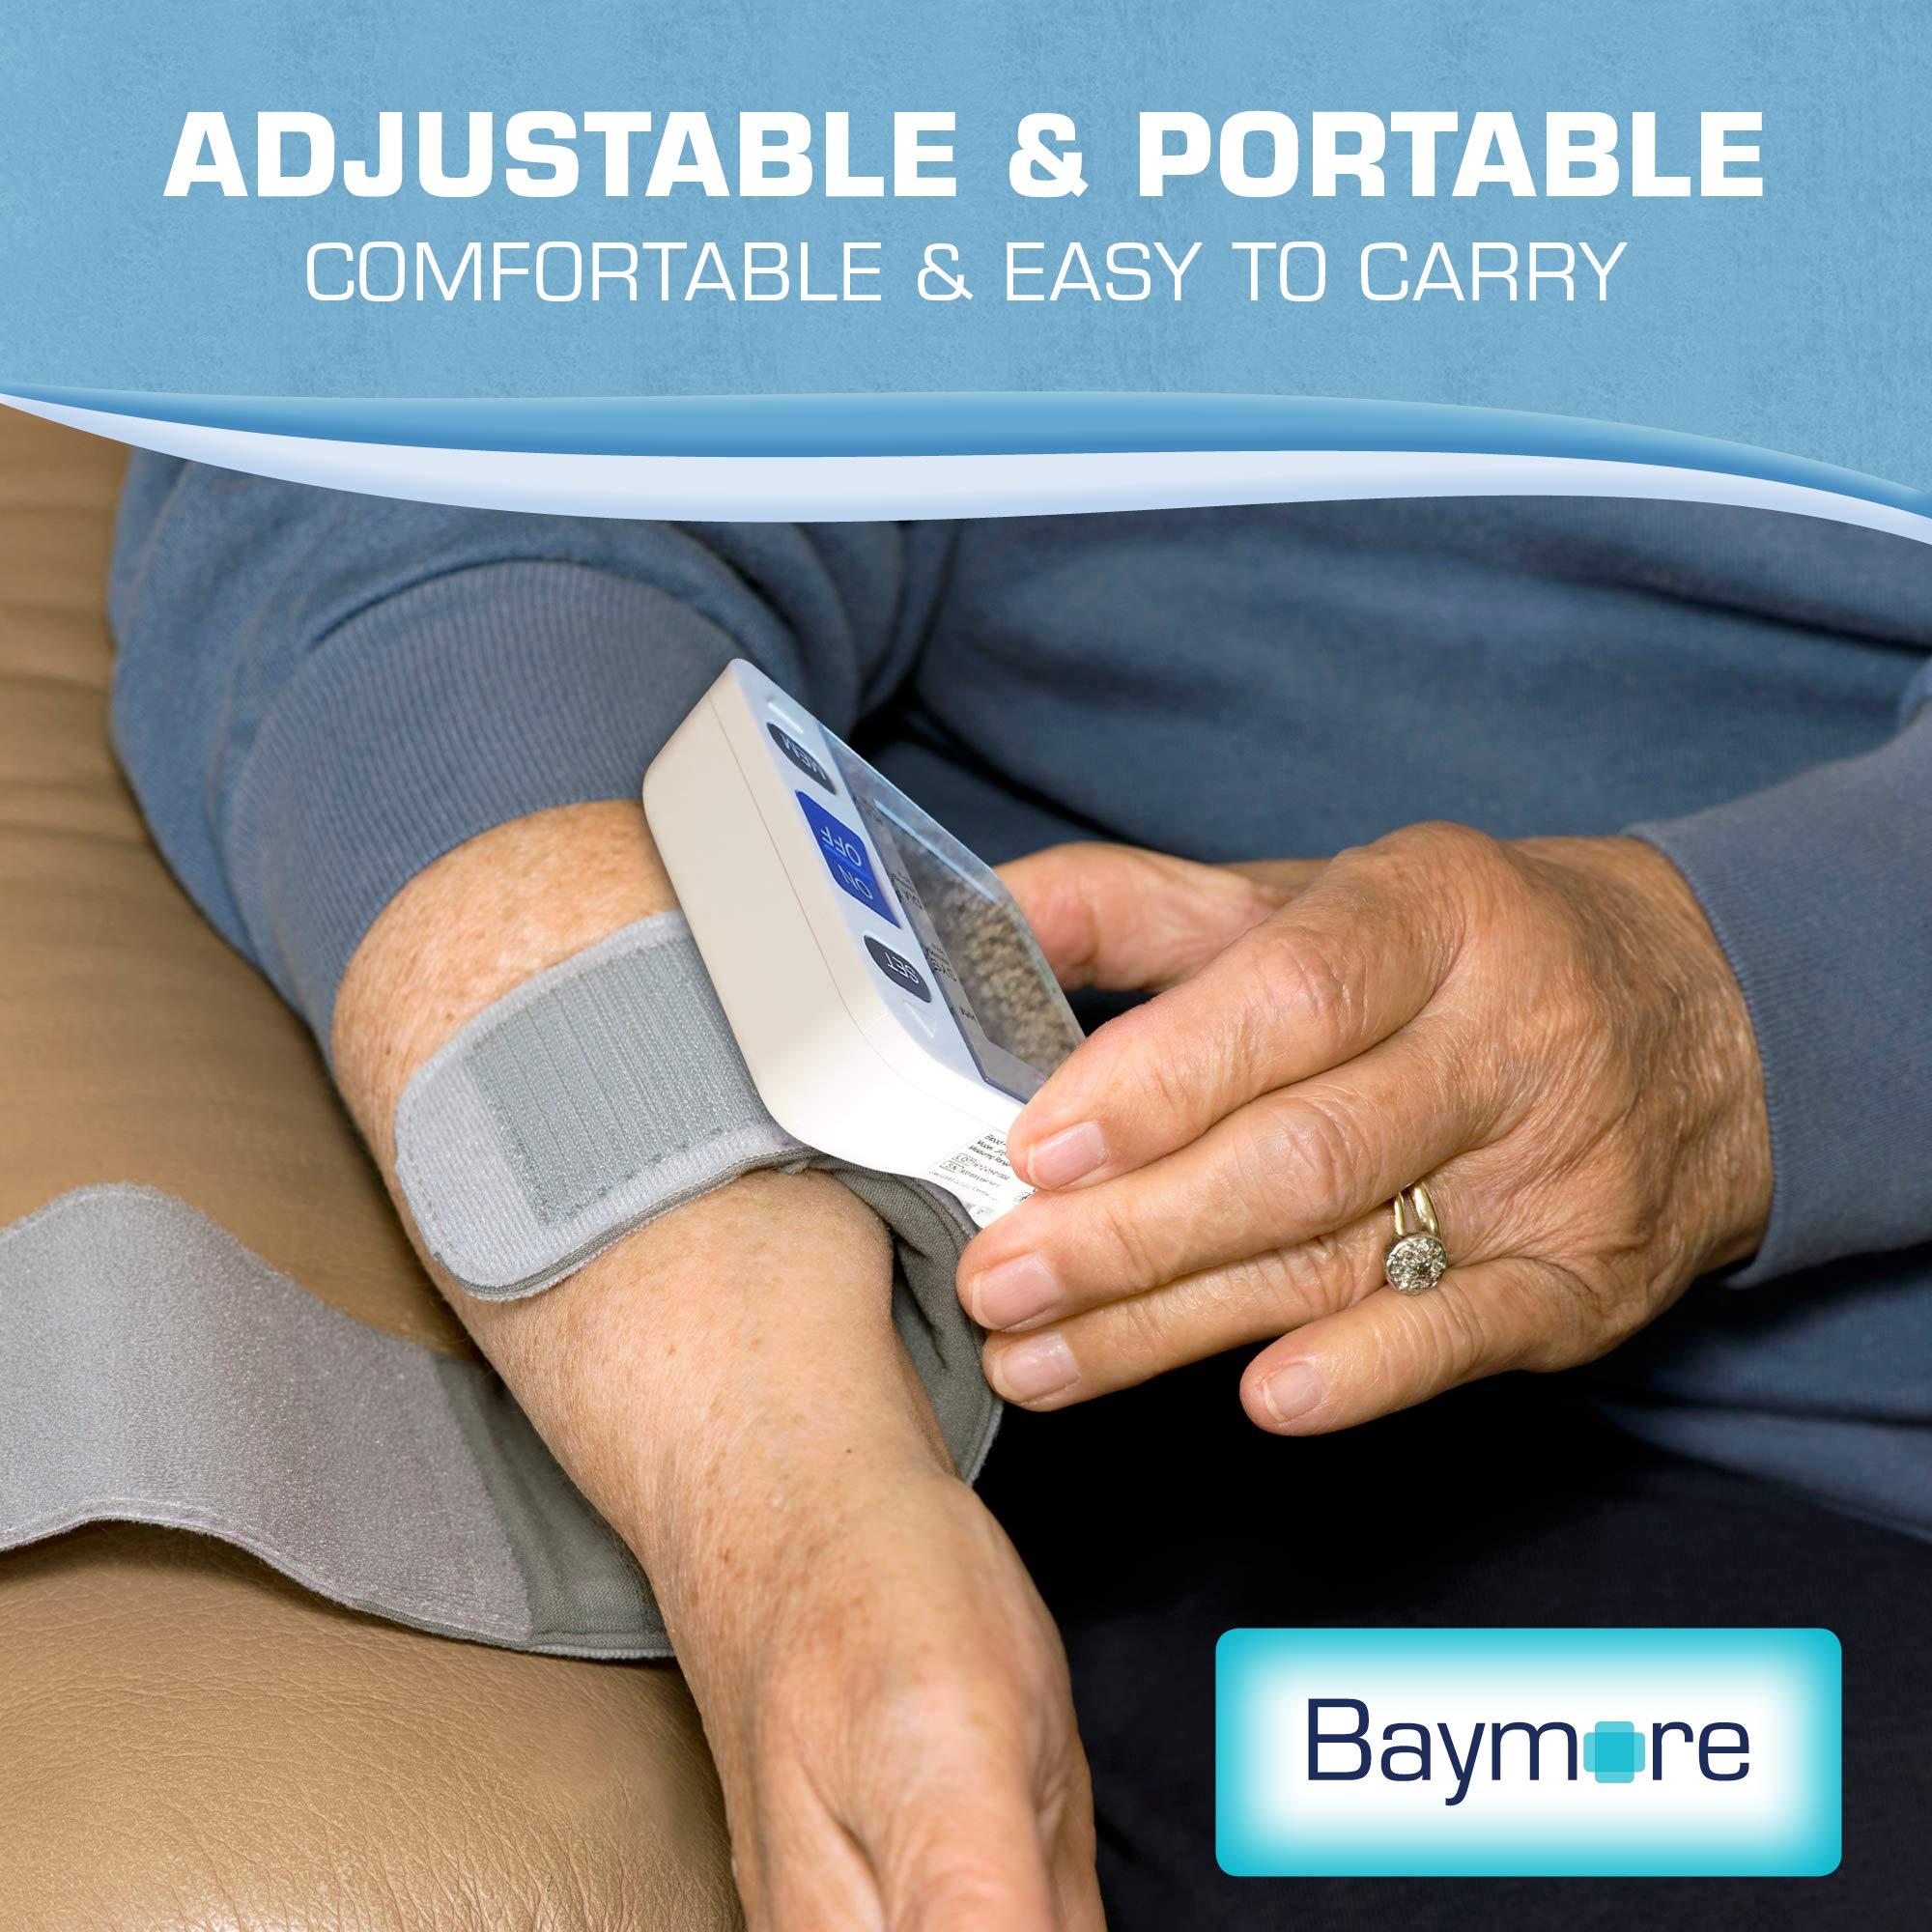 Baymore Digital Wrist Blood Pressure Monitor Cuff by Baymore (Image #6)